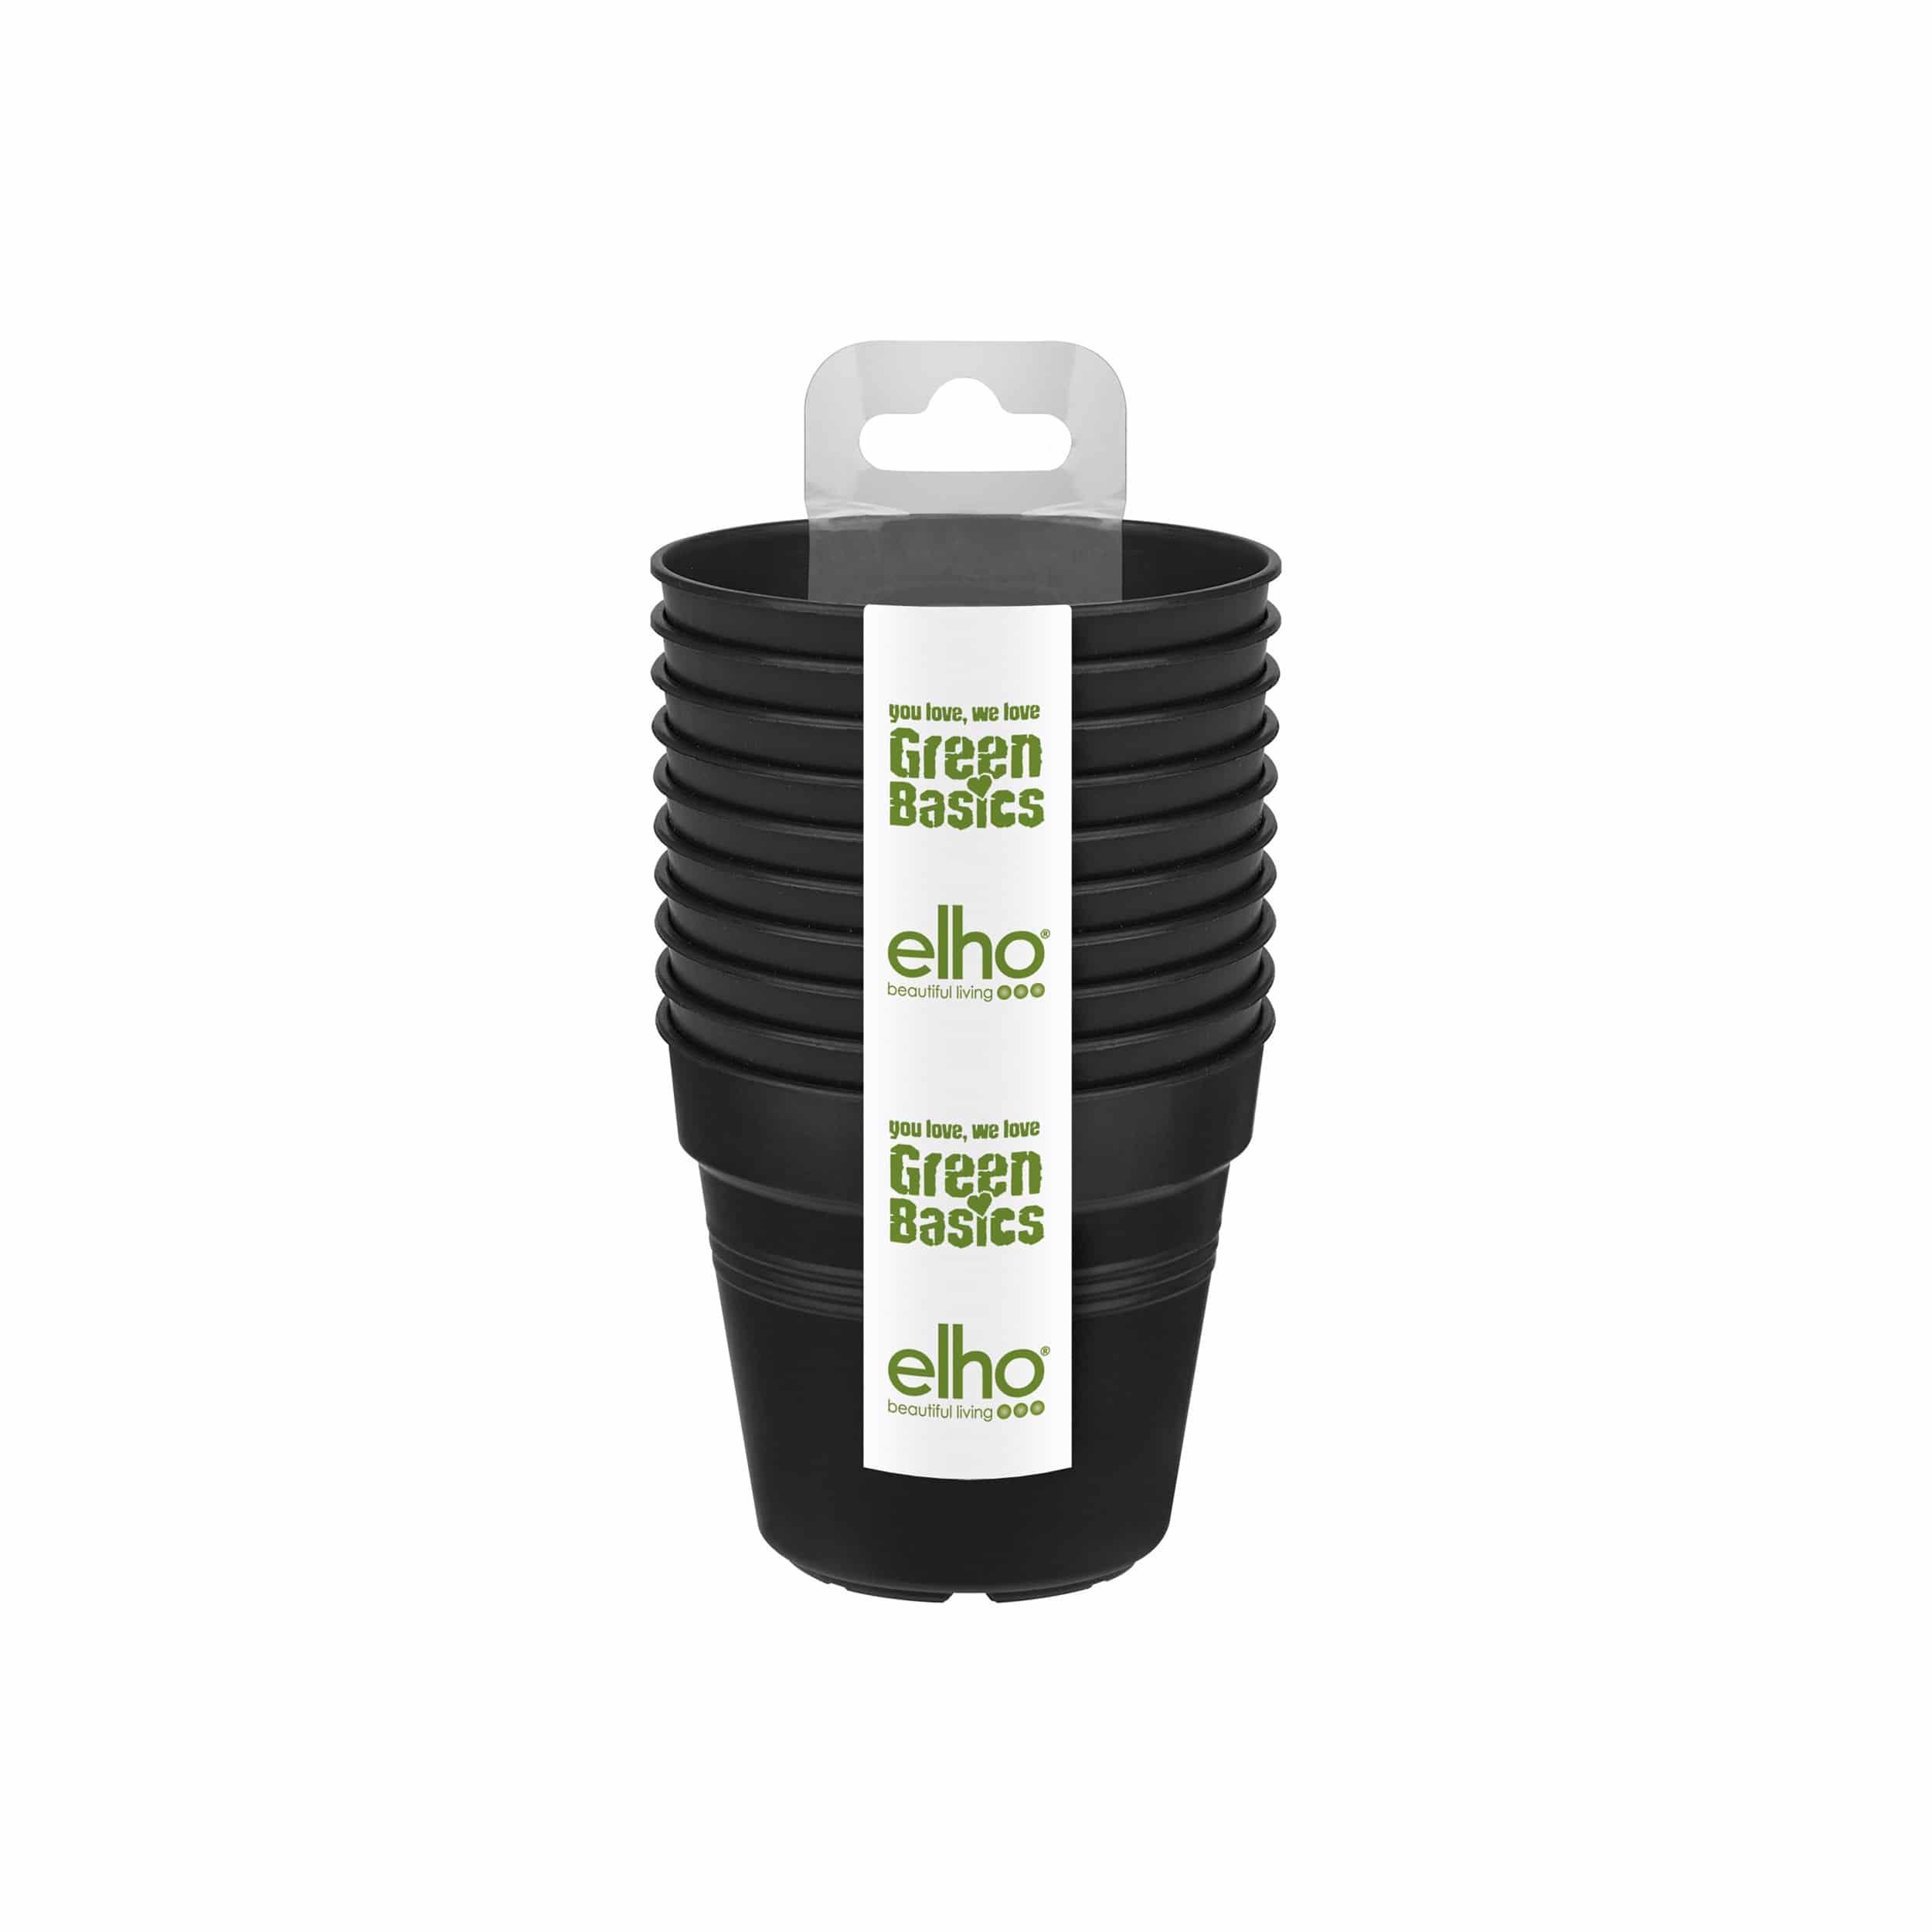 Anzuchttopf Green Basics 10er-Starter-Set